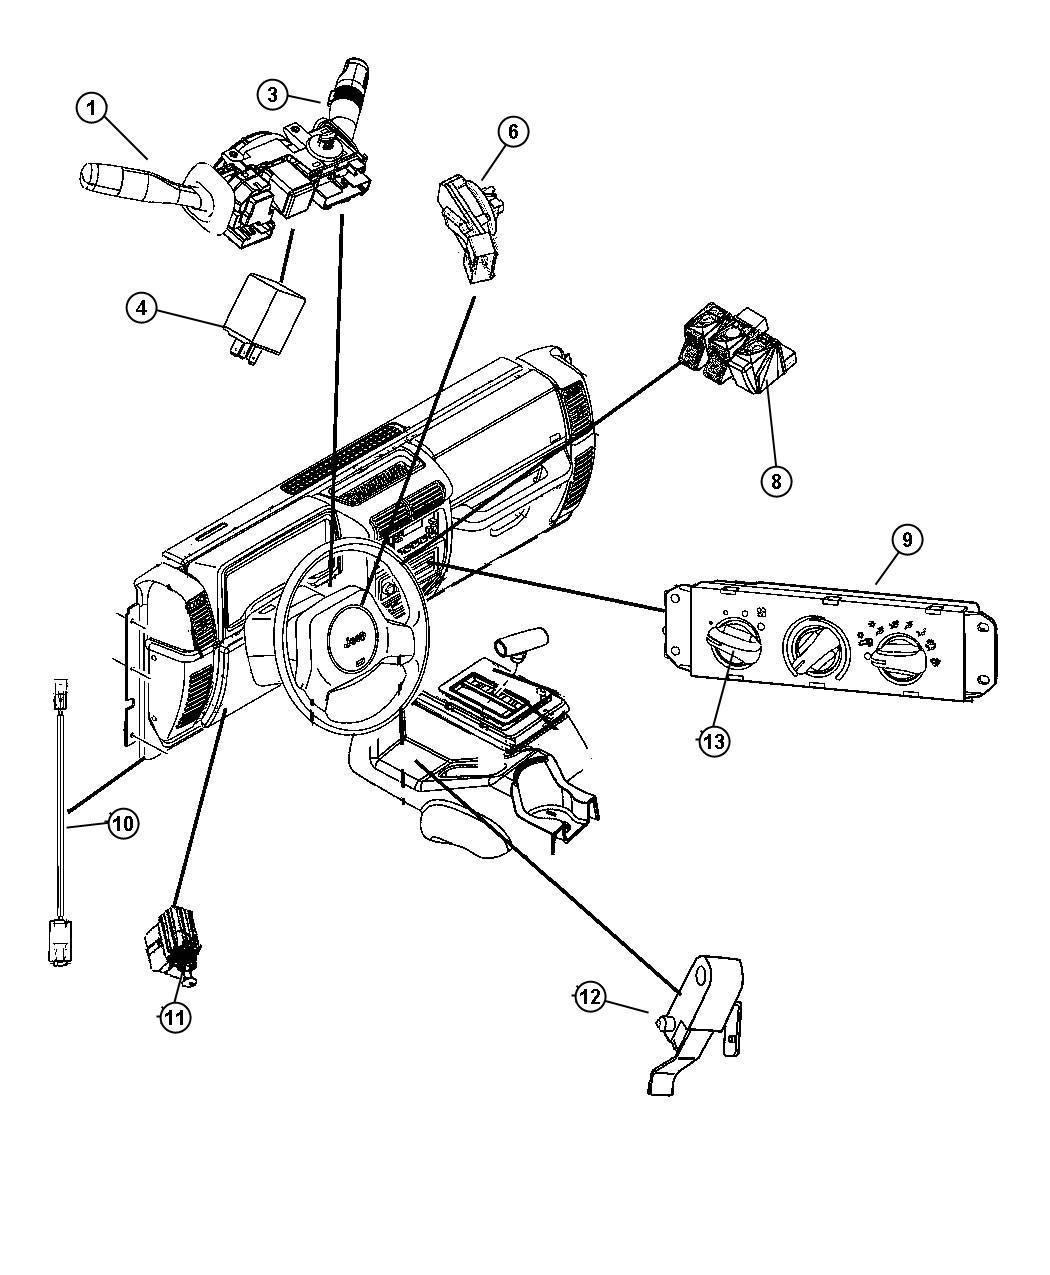 jeep wrangler flasher  hazard flasher  hazard warning  black  after 12-11-97